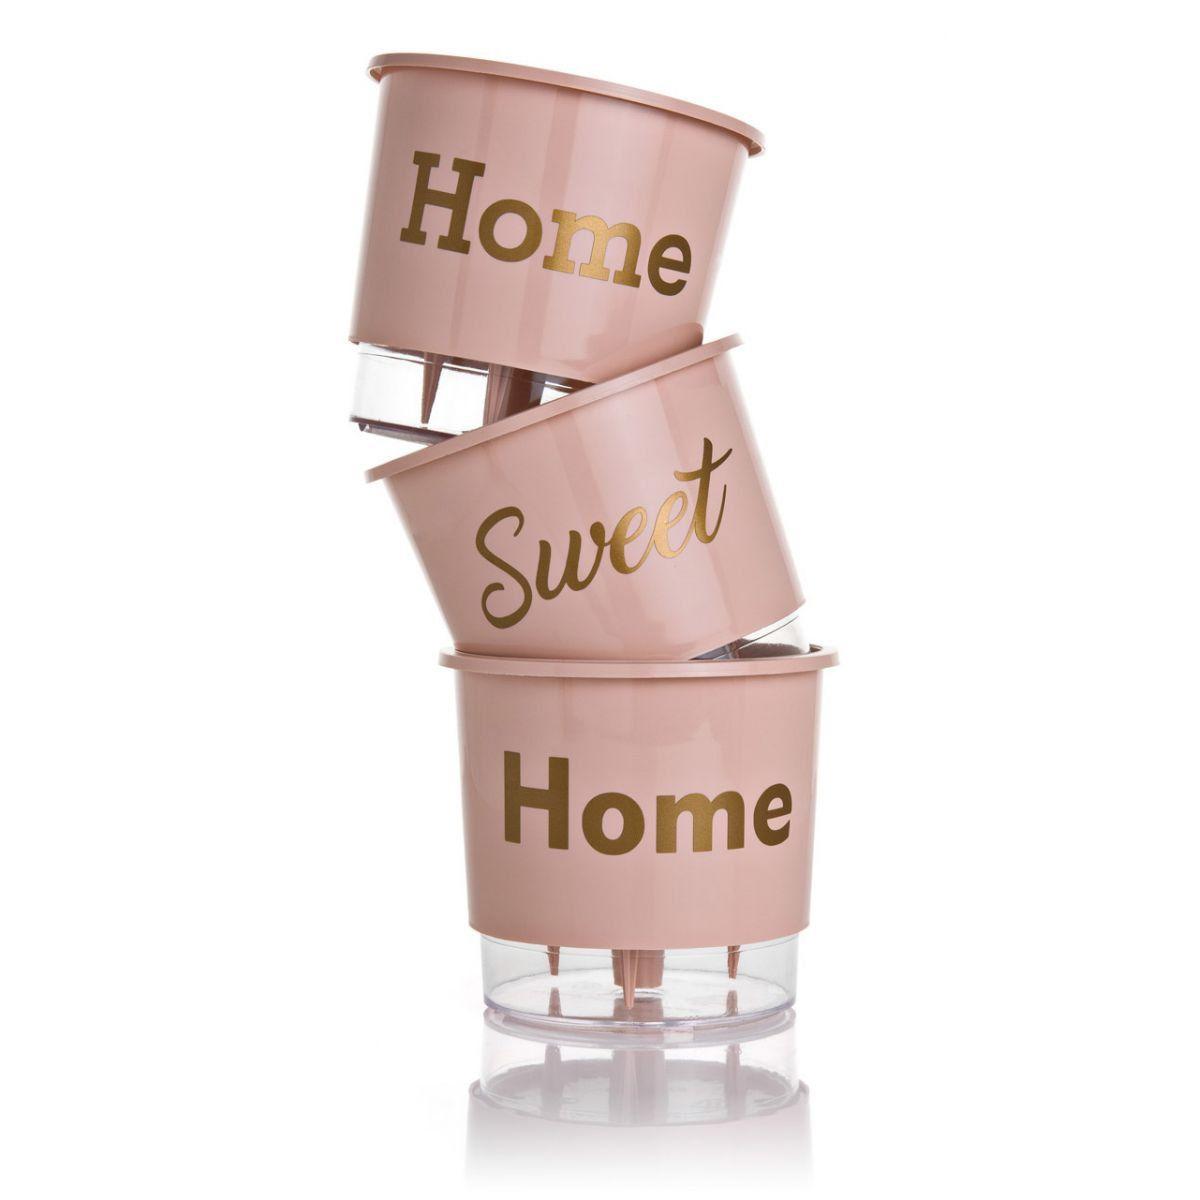 Kit 3 Vasos Autoirrigáveis Pequenos N02 12 cm x 11 cm Home Sweet Home Rosa Quartzo